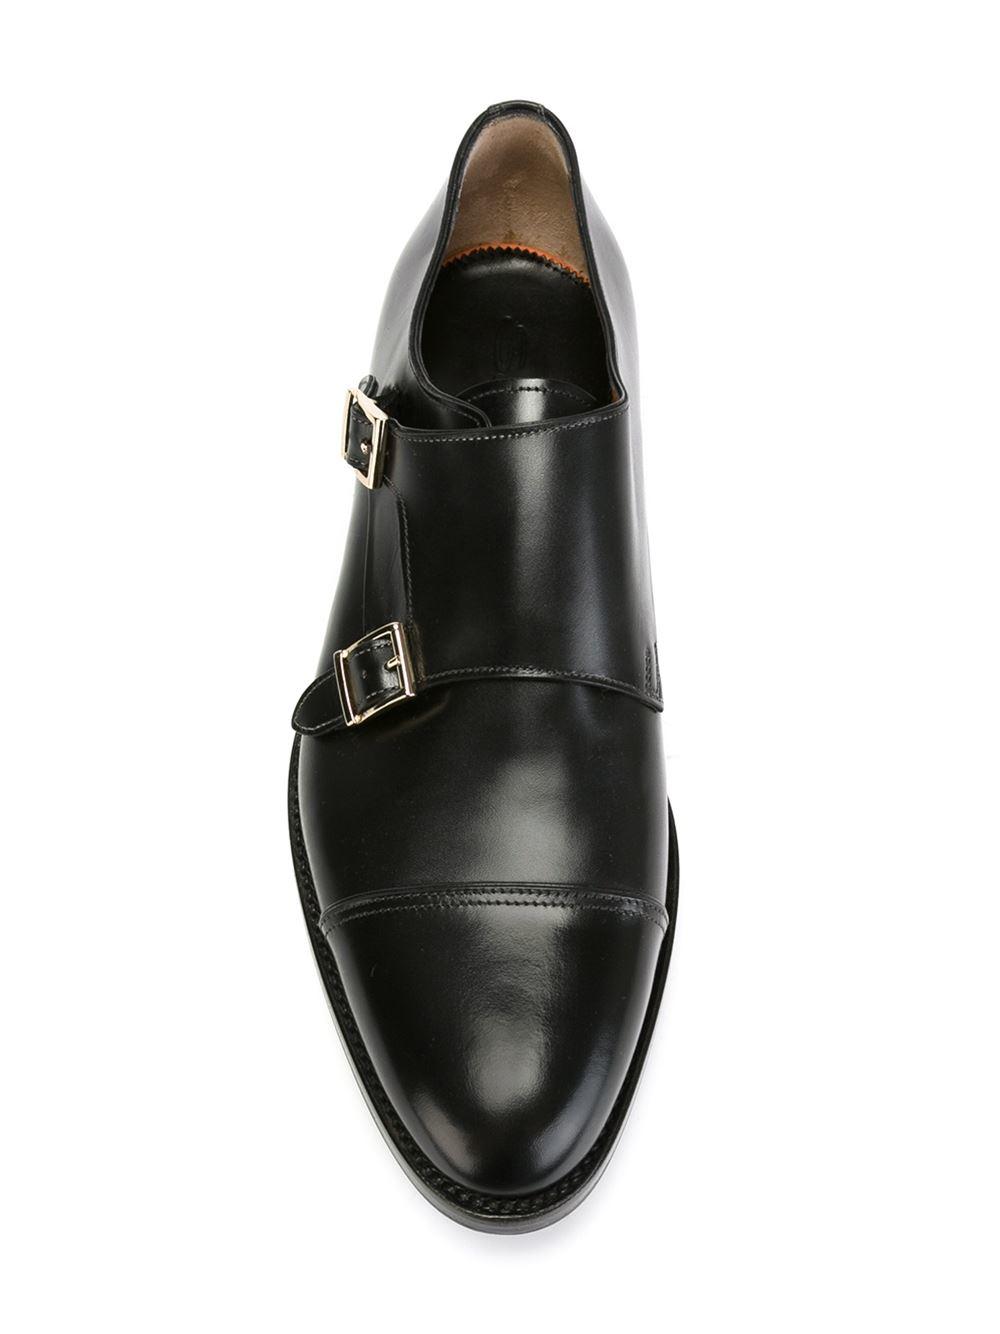 Lyst Santoni Monk Strap Shoes In Black For Men